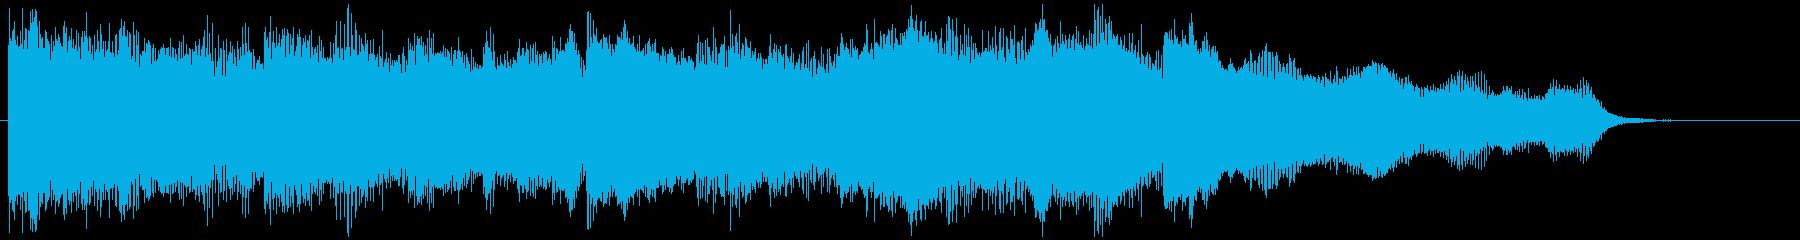 VP・CM 癒やし系ピアノとストリングスの再生済みの波形